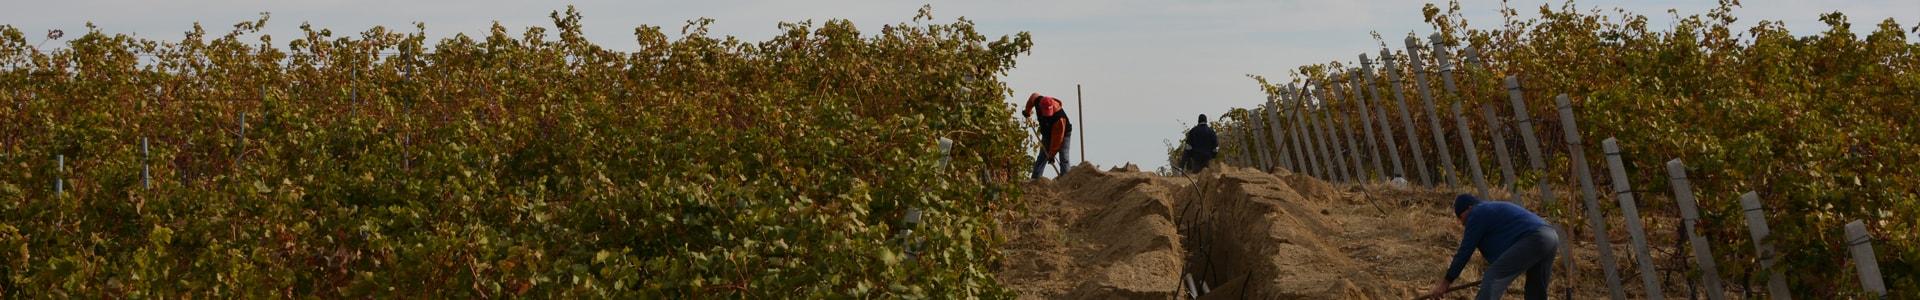 viticultura img mare